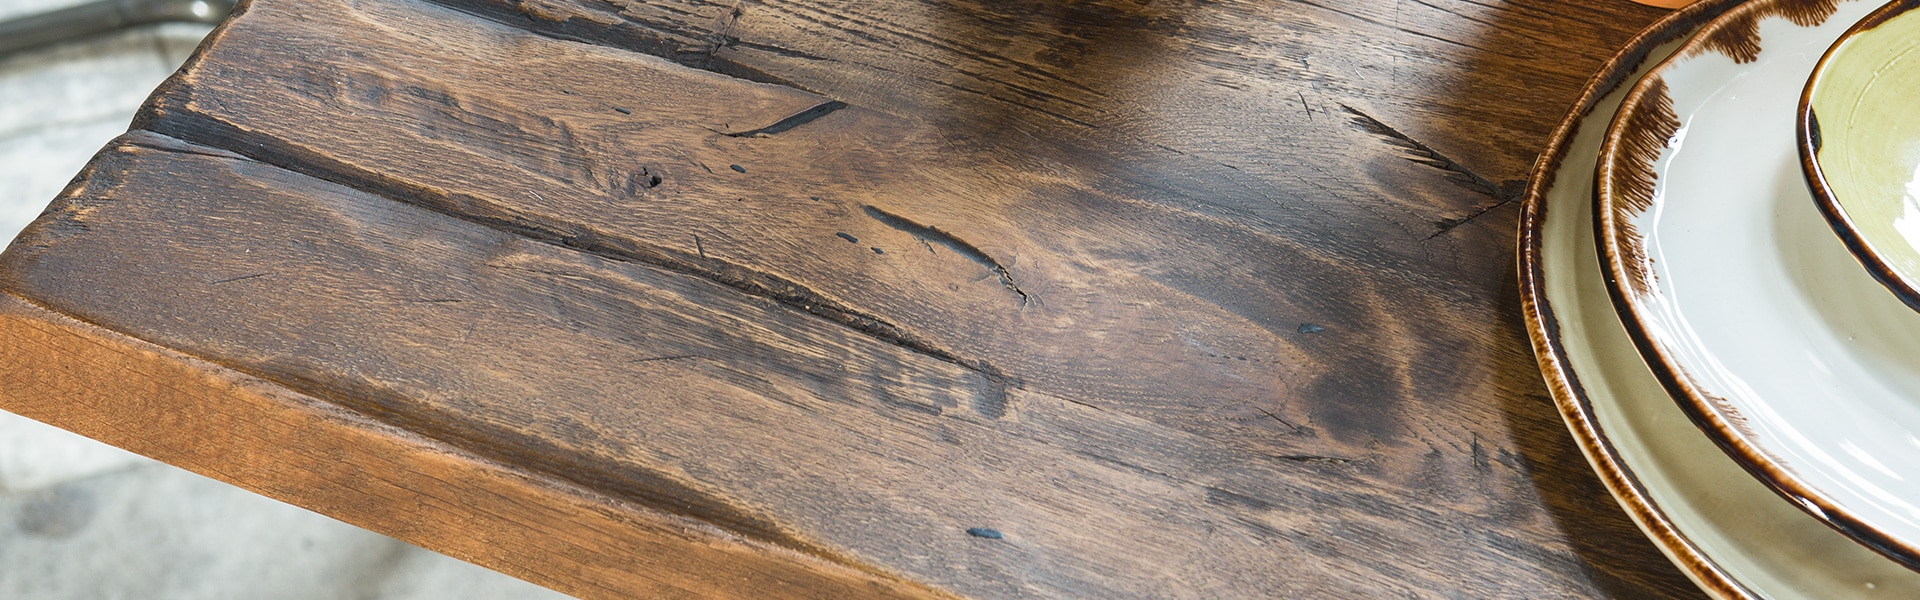 Ongebruikt Melamine tafelbladen voor horecatafels - Okido B.V. CM-46